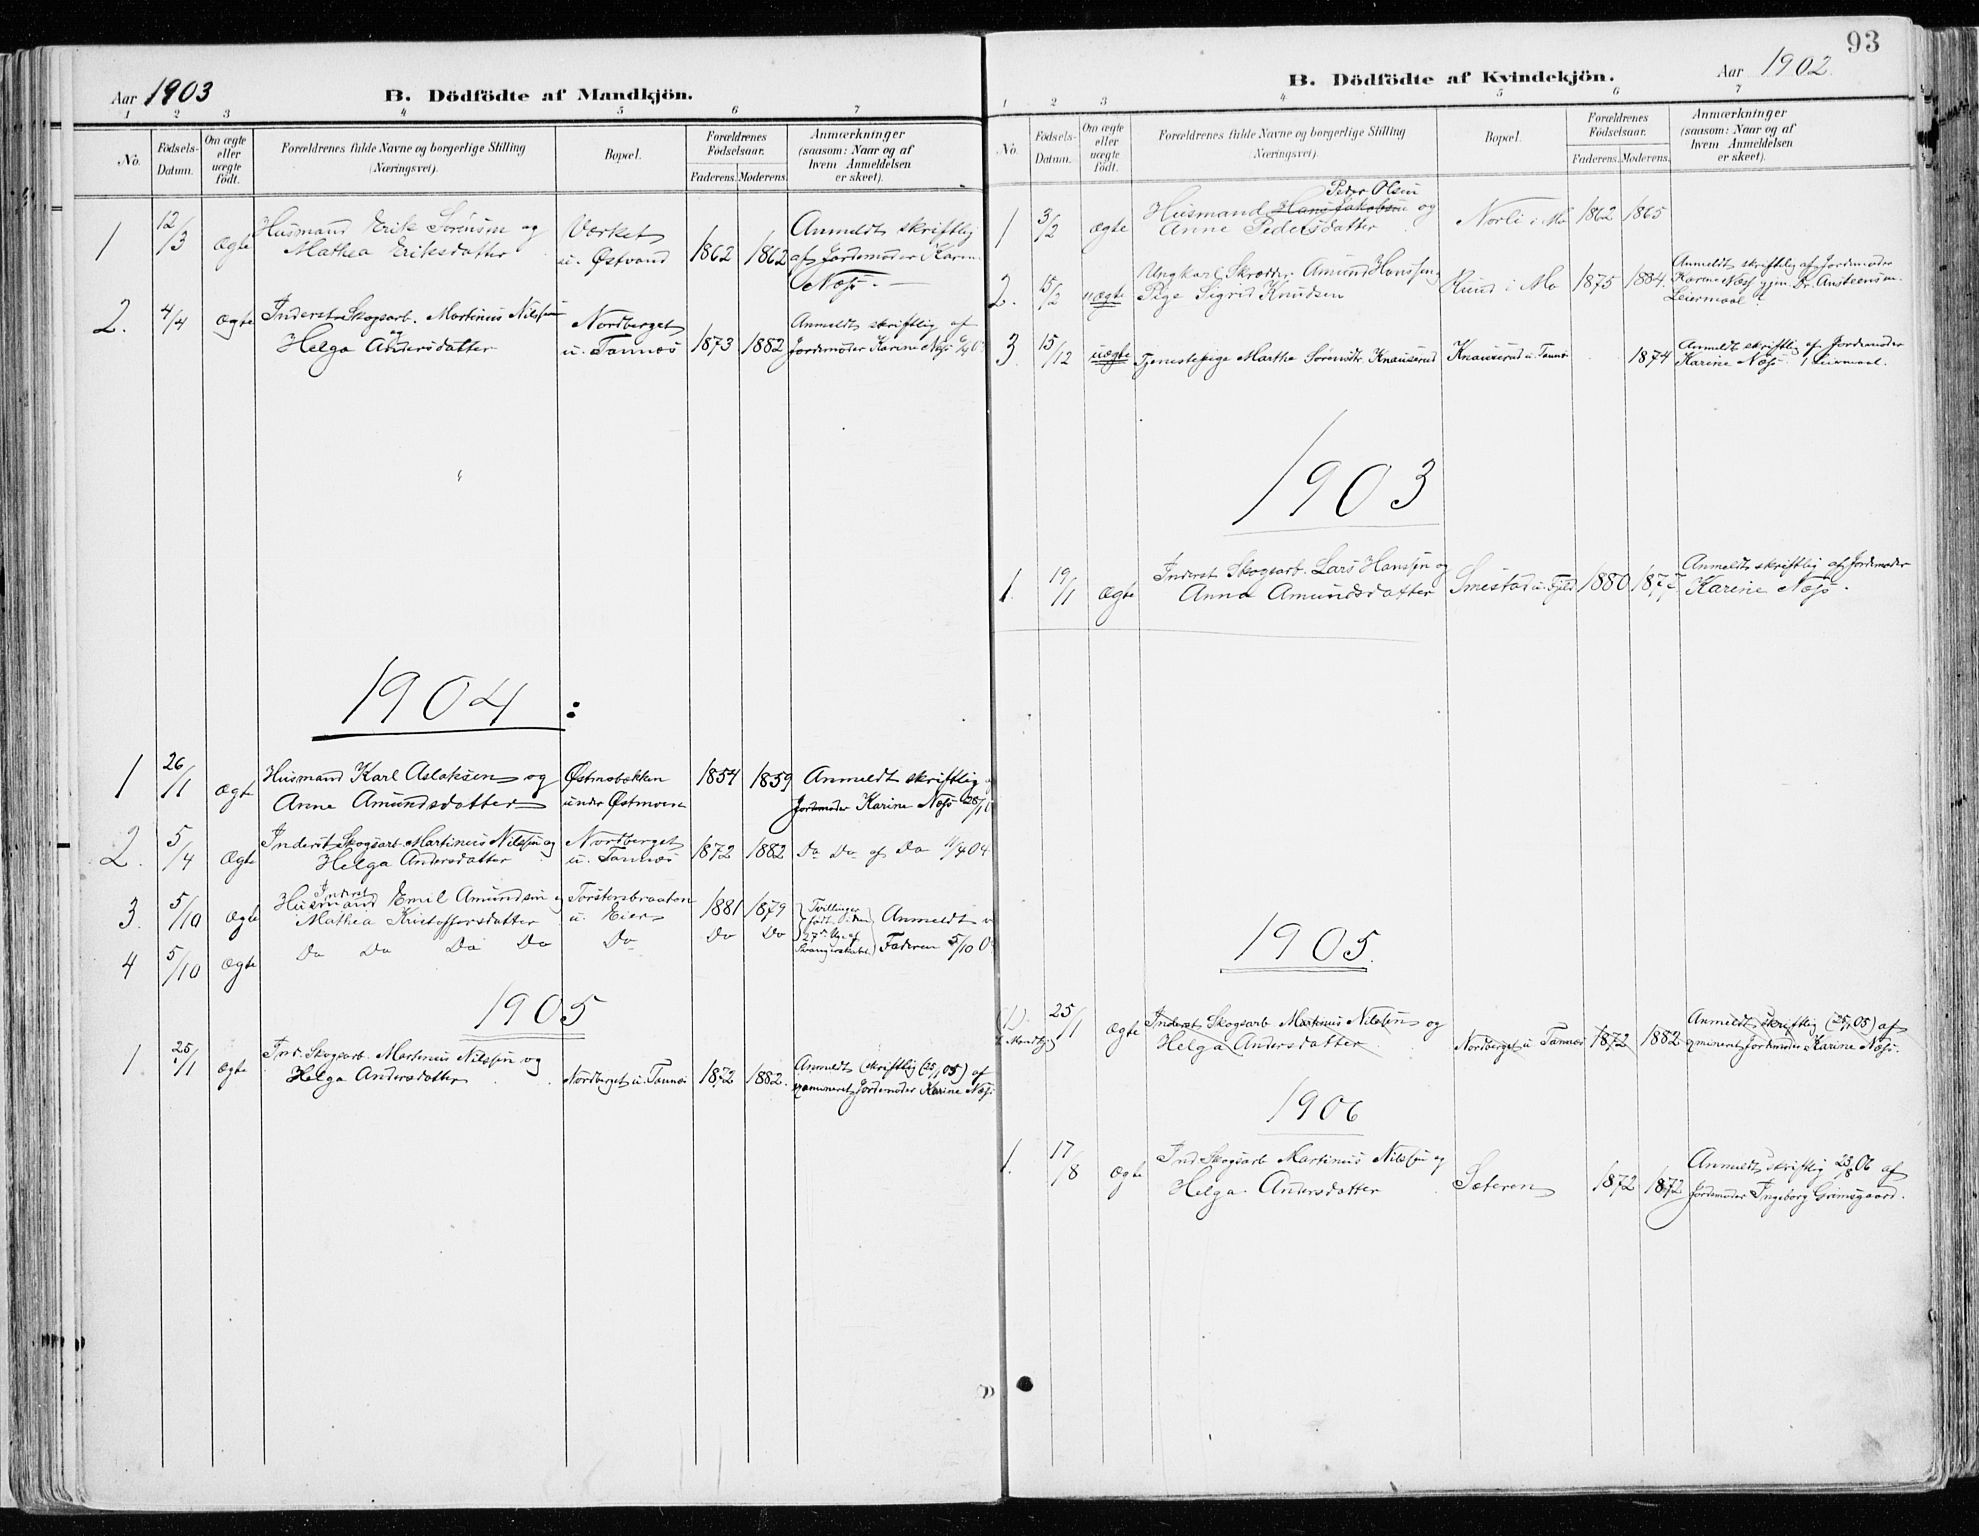 SAH, Nord-Odal prestekontor, Ministerialbok nr. 9, 1902-1926, s. 93